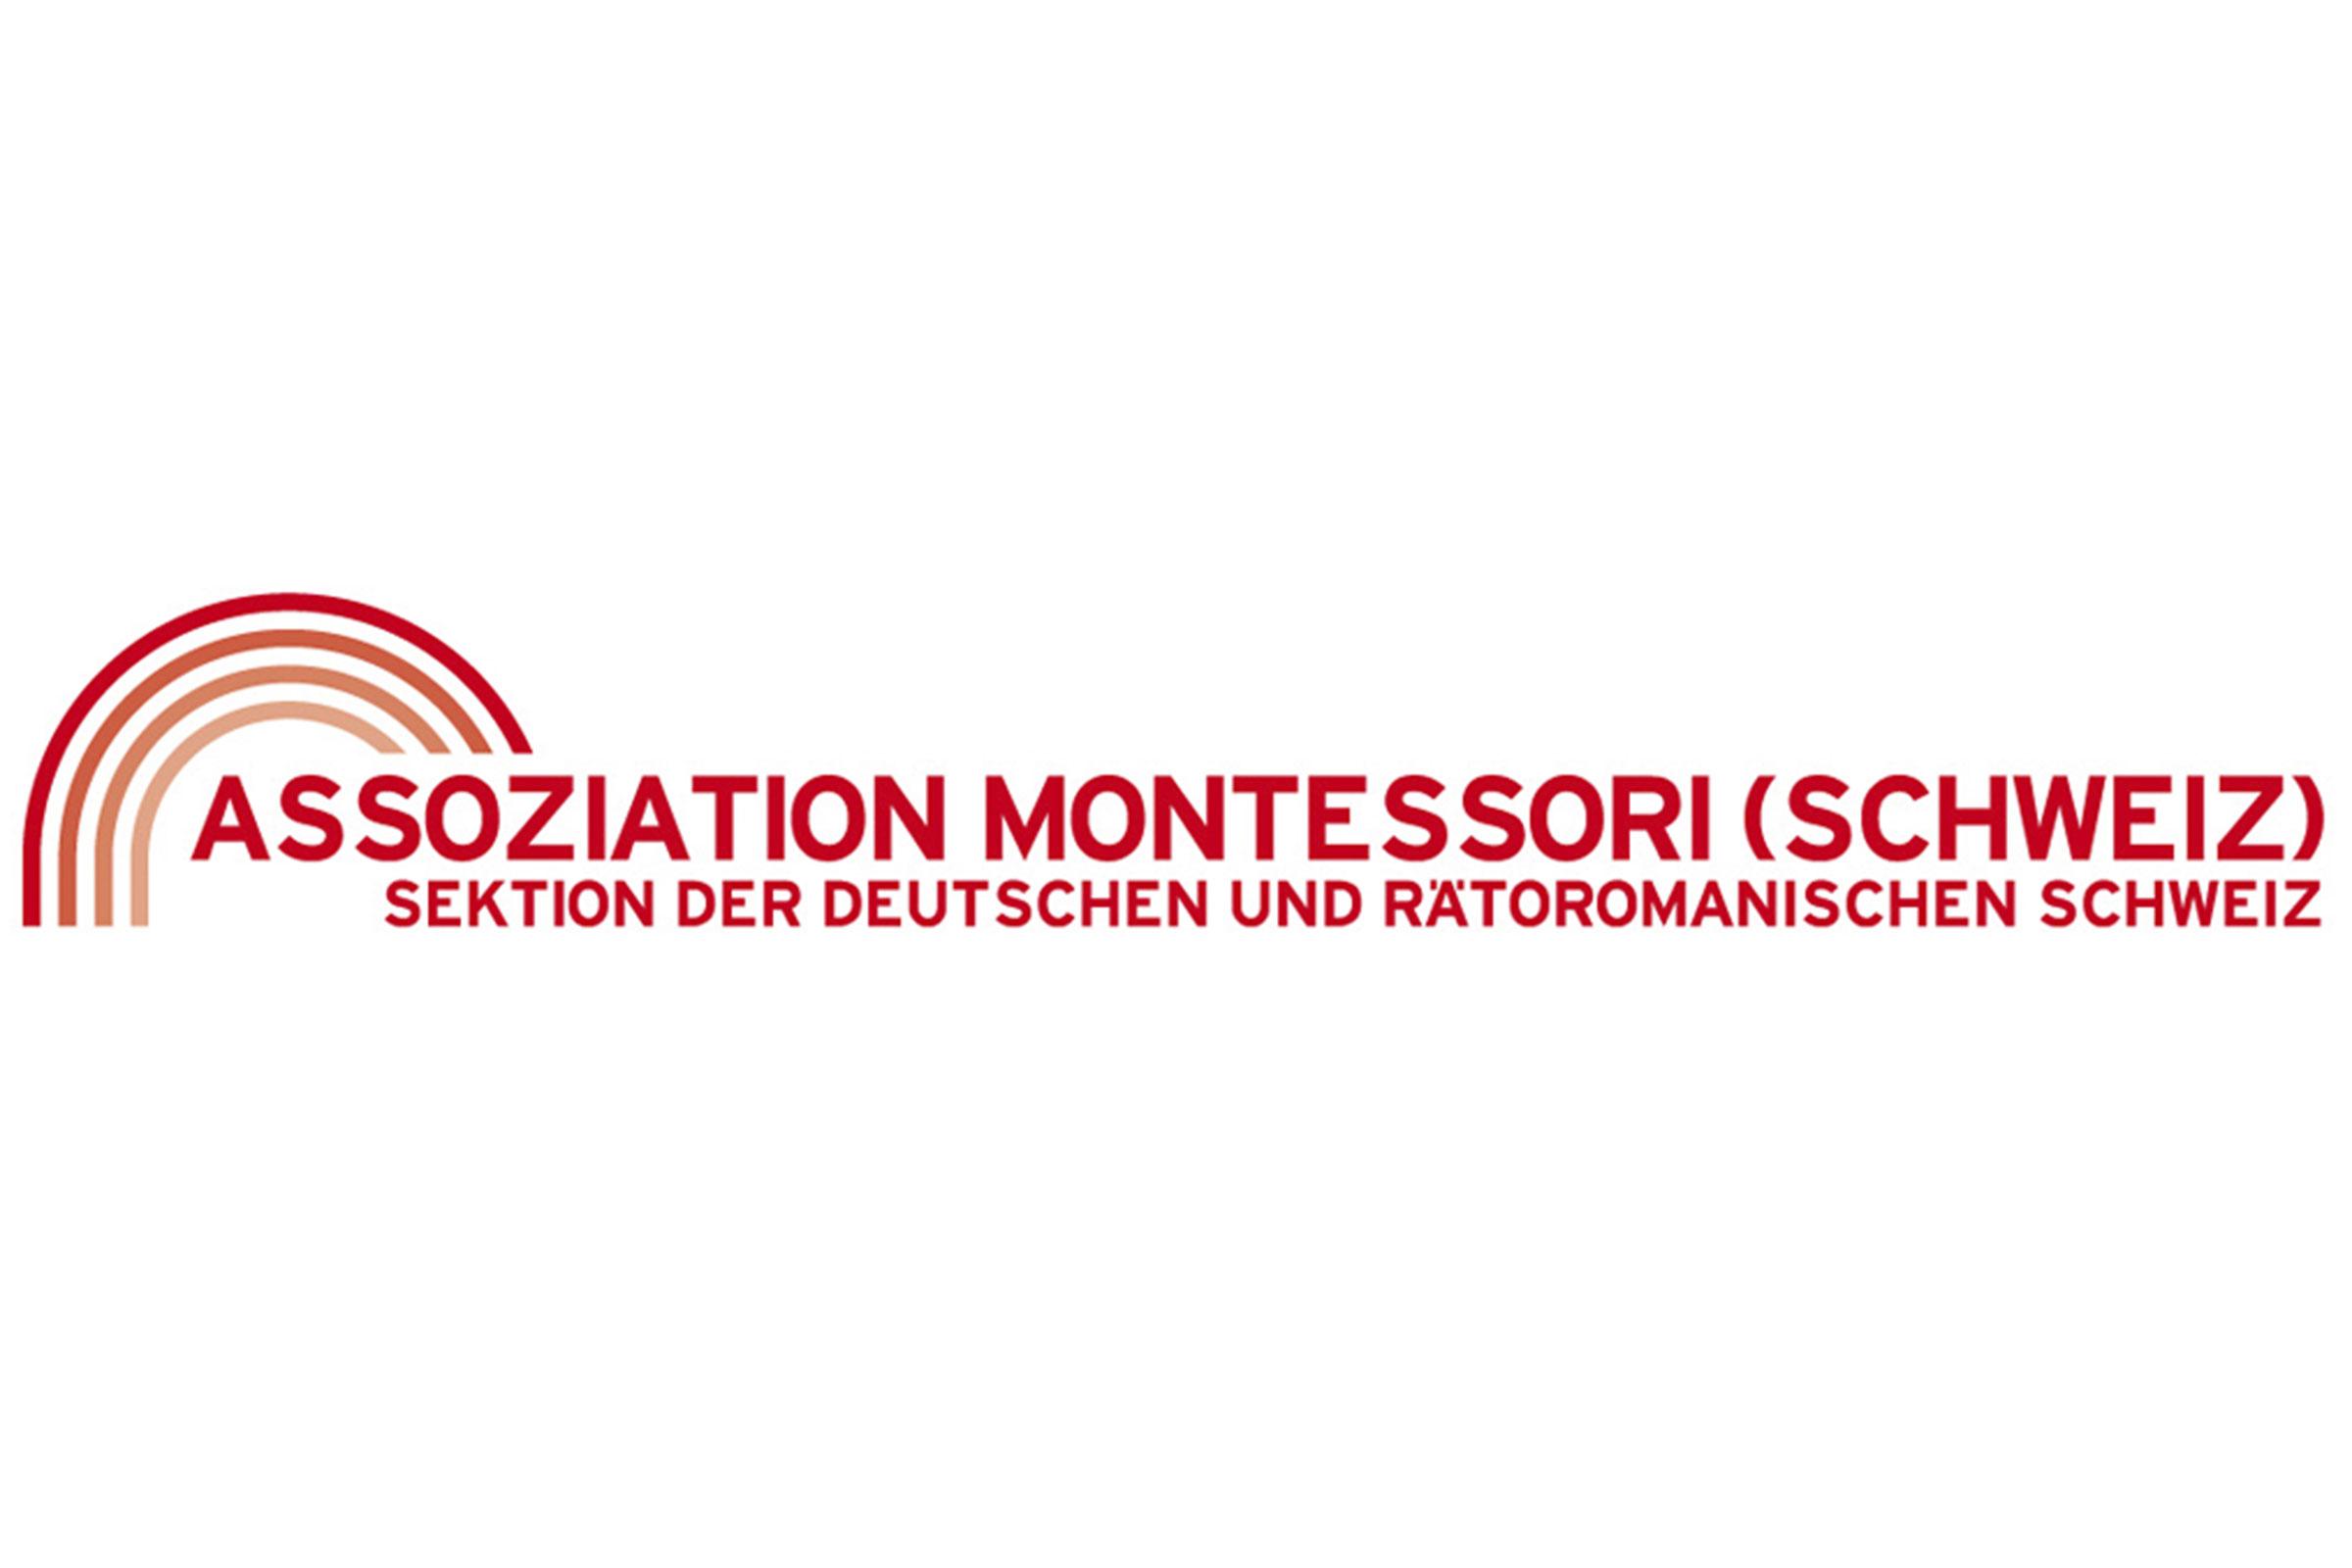 Assoziation Montessori (Schweiz) logo